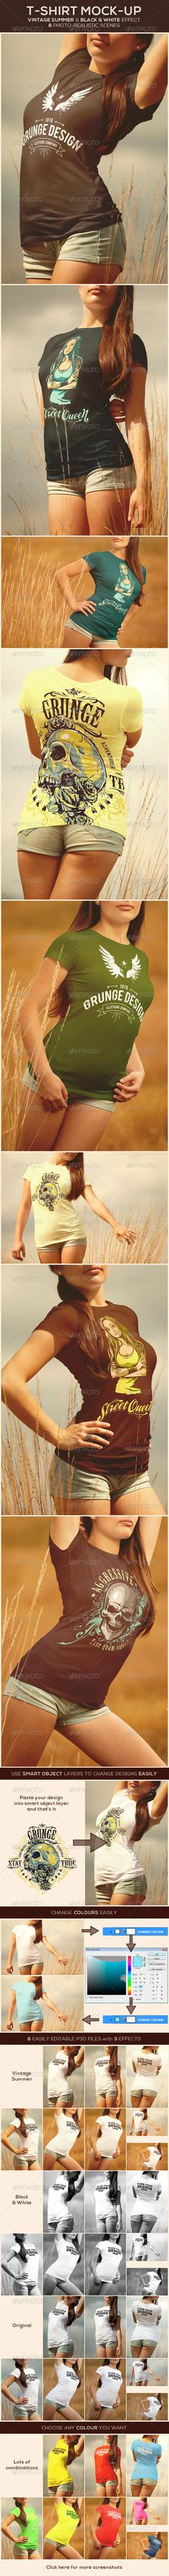 T-Shirt Mock-Up   #tshirtmockup #t-shirtmockup #mockups   Download: http://graphicriver.net/item/tshirt-mockup/8753129?ref=ksioks